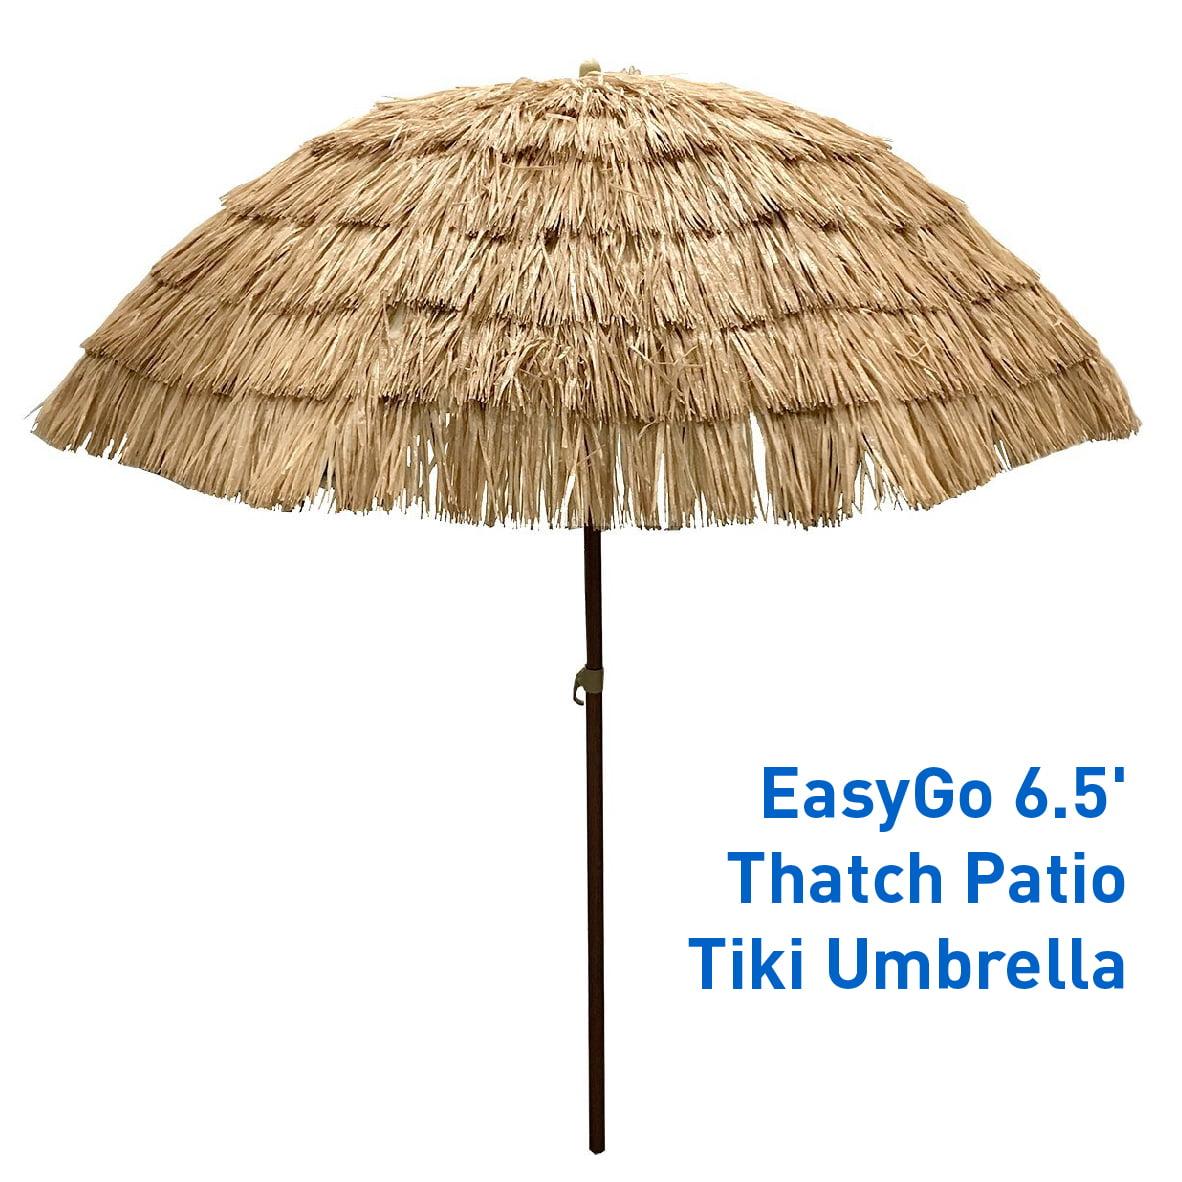 EasyGo 8' Thatch Patio Tiki Umbrella ? Tropical Palapa Raffia Tiki Hut Hawaiian Hula Beach... by Outdoor Umbrellas